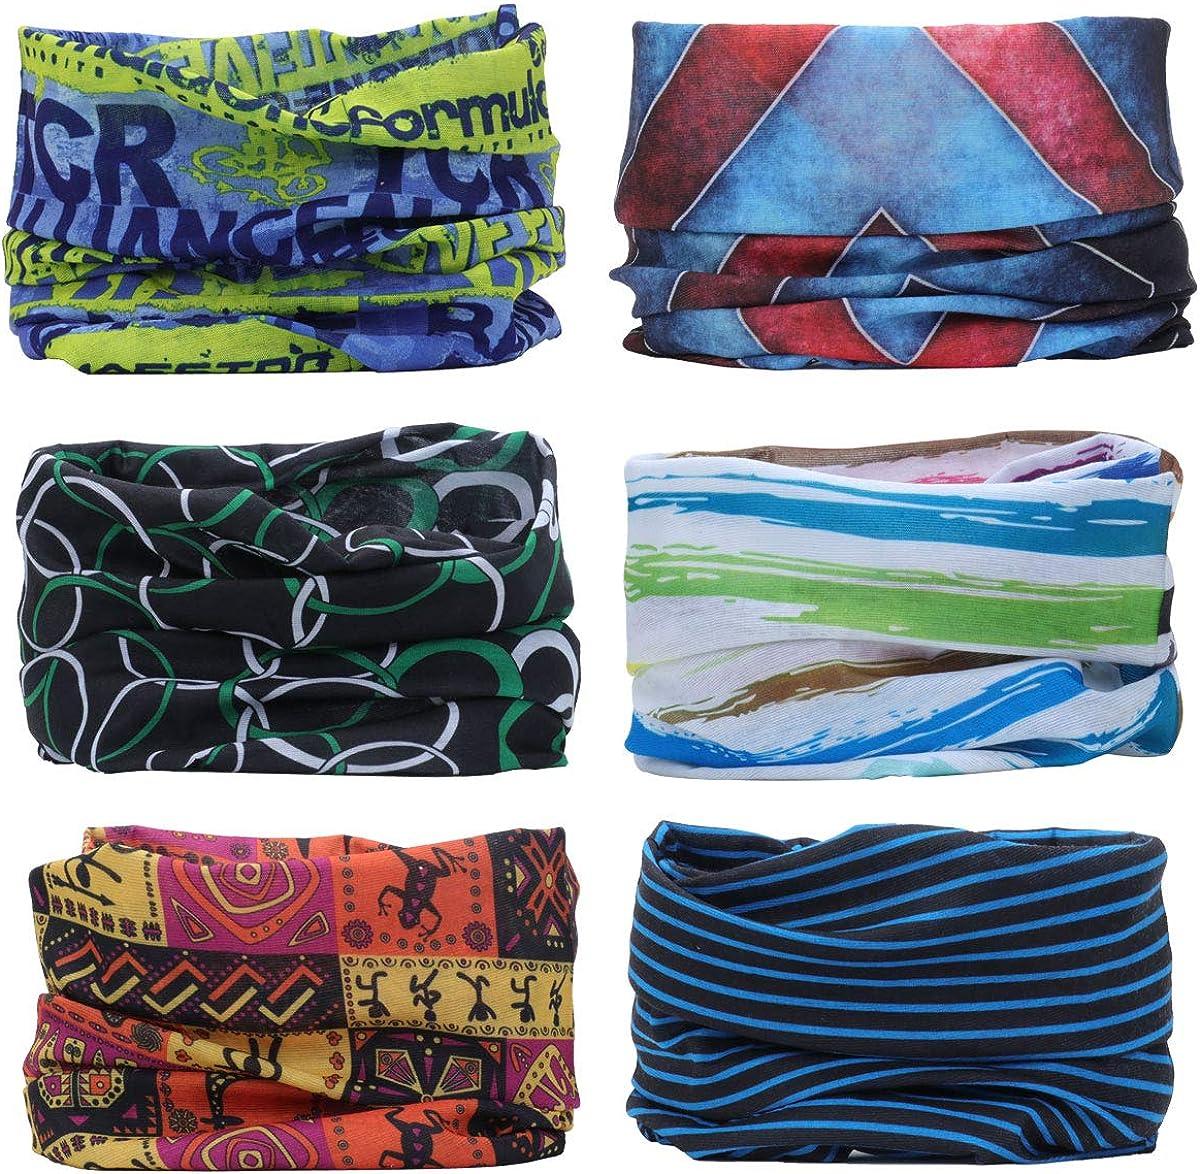 YouGa Headwear Headbands 6PCS Multifunctional Bandana Wide Seamless Magic Scarf Tube Scarf UV Insect Shield Sport Men Women Unisex